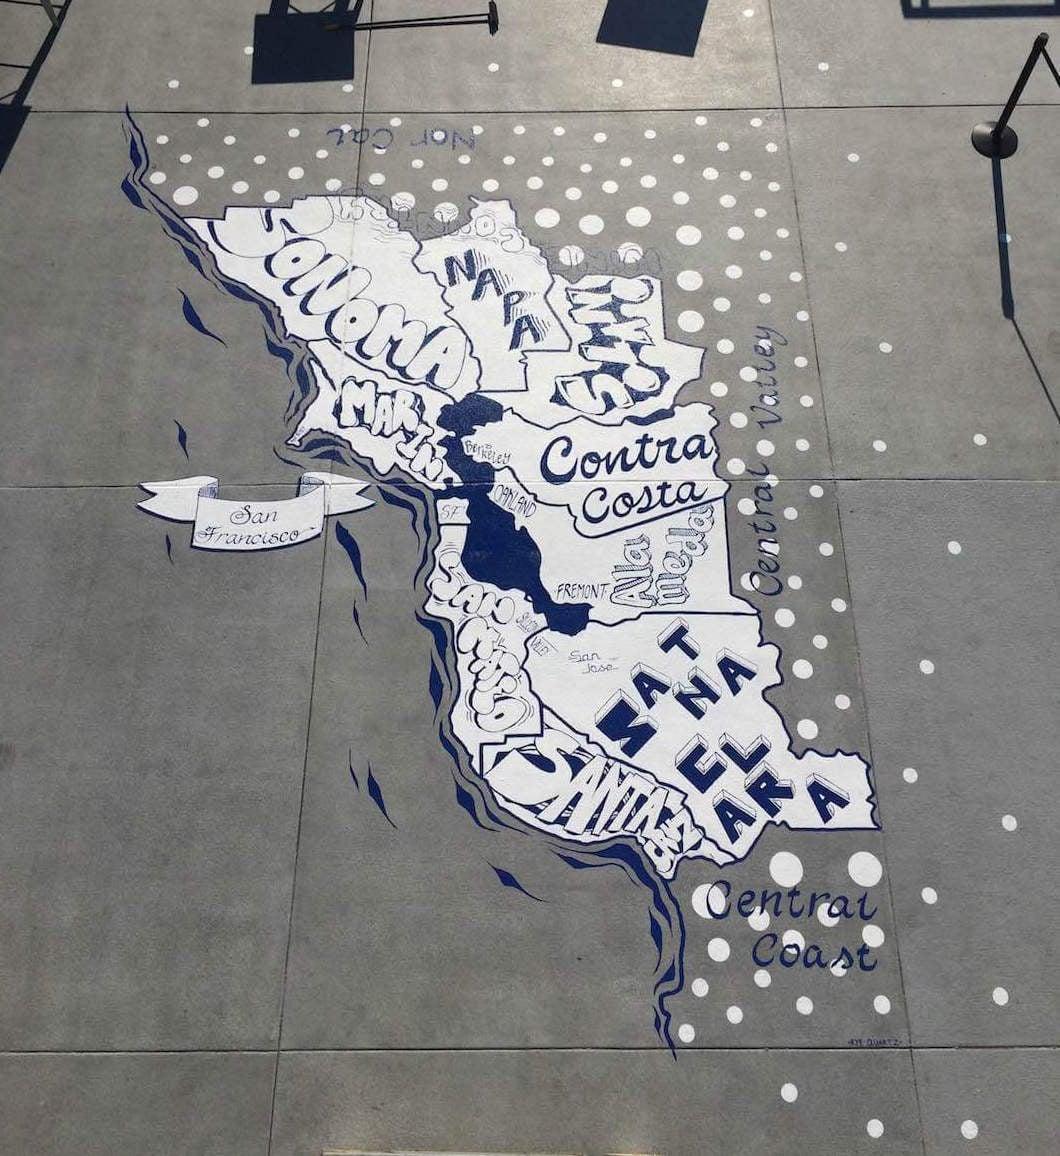 Commissioned Outdoor Mural 6 for GPJ | Levi's Stadium, Santa Clara USA, 2015